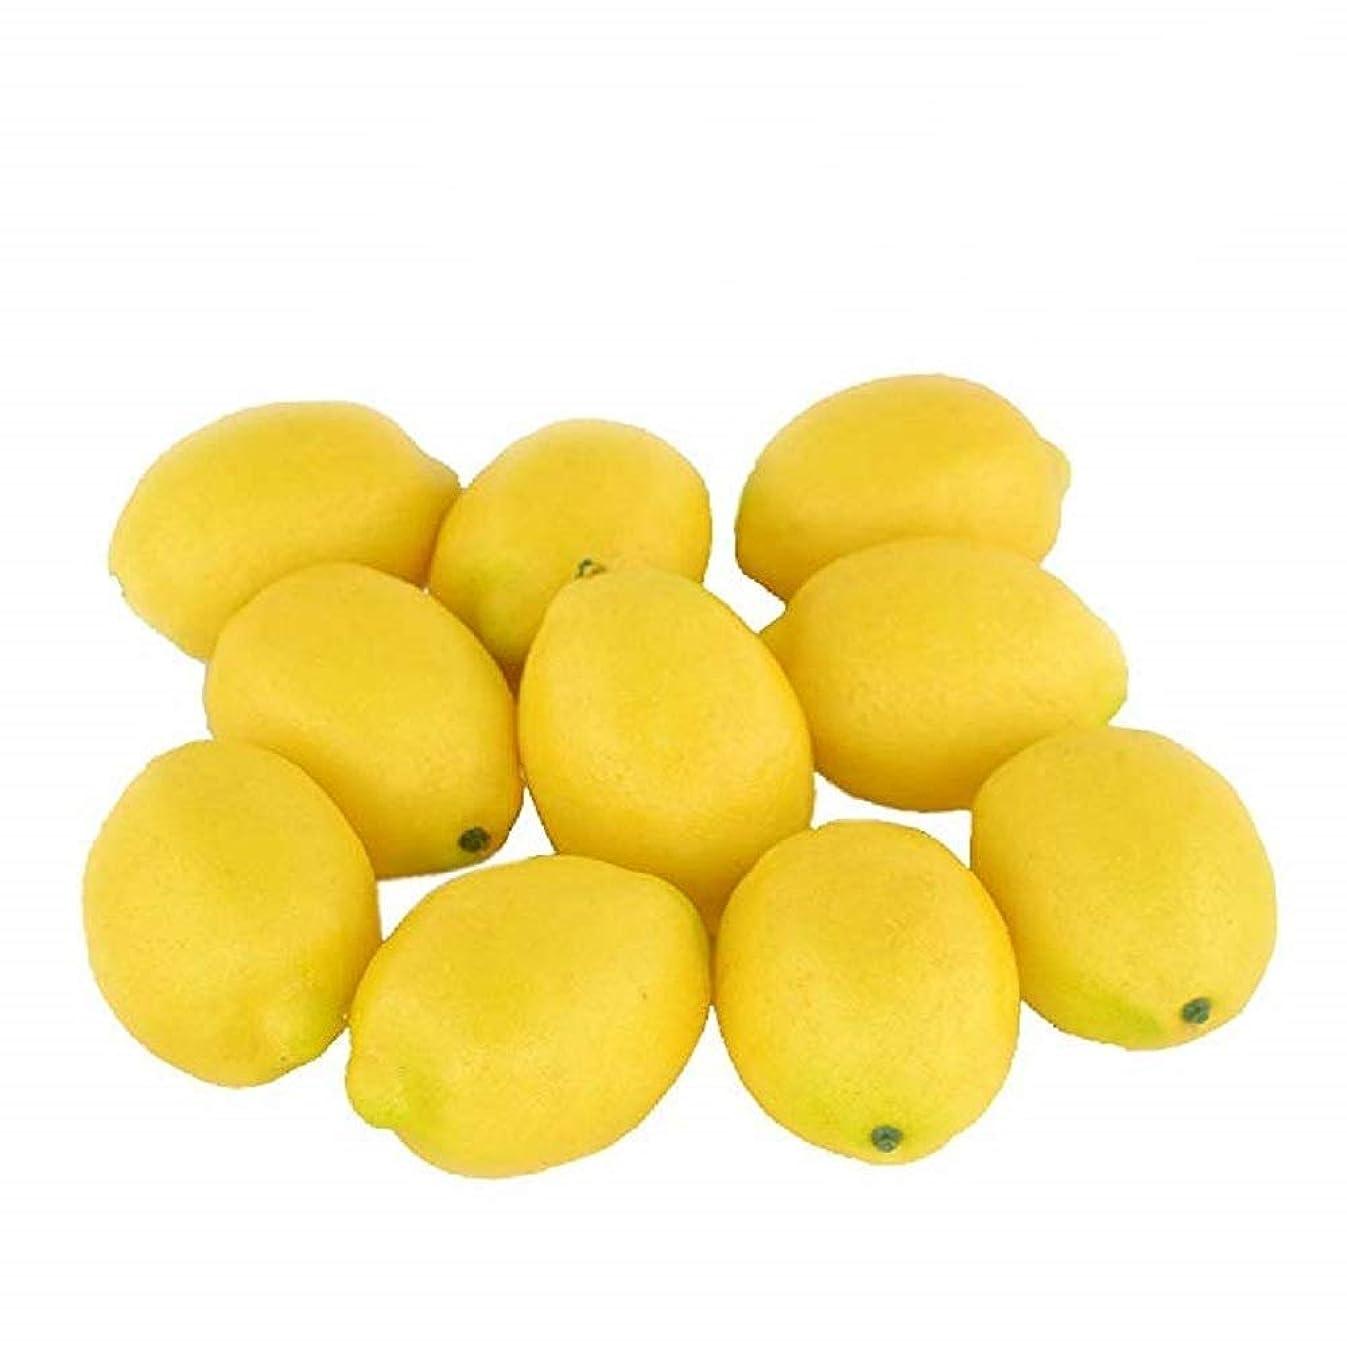 Sohapy 10pcs Yellow Artificial Lifelike Simulation Lemon Fake Fruit For Home Kitchen Cabinet Decoration